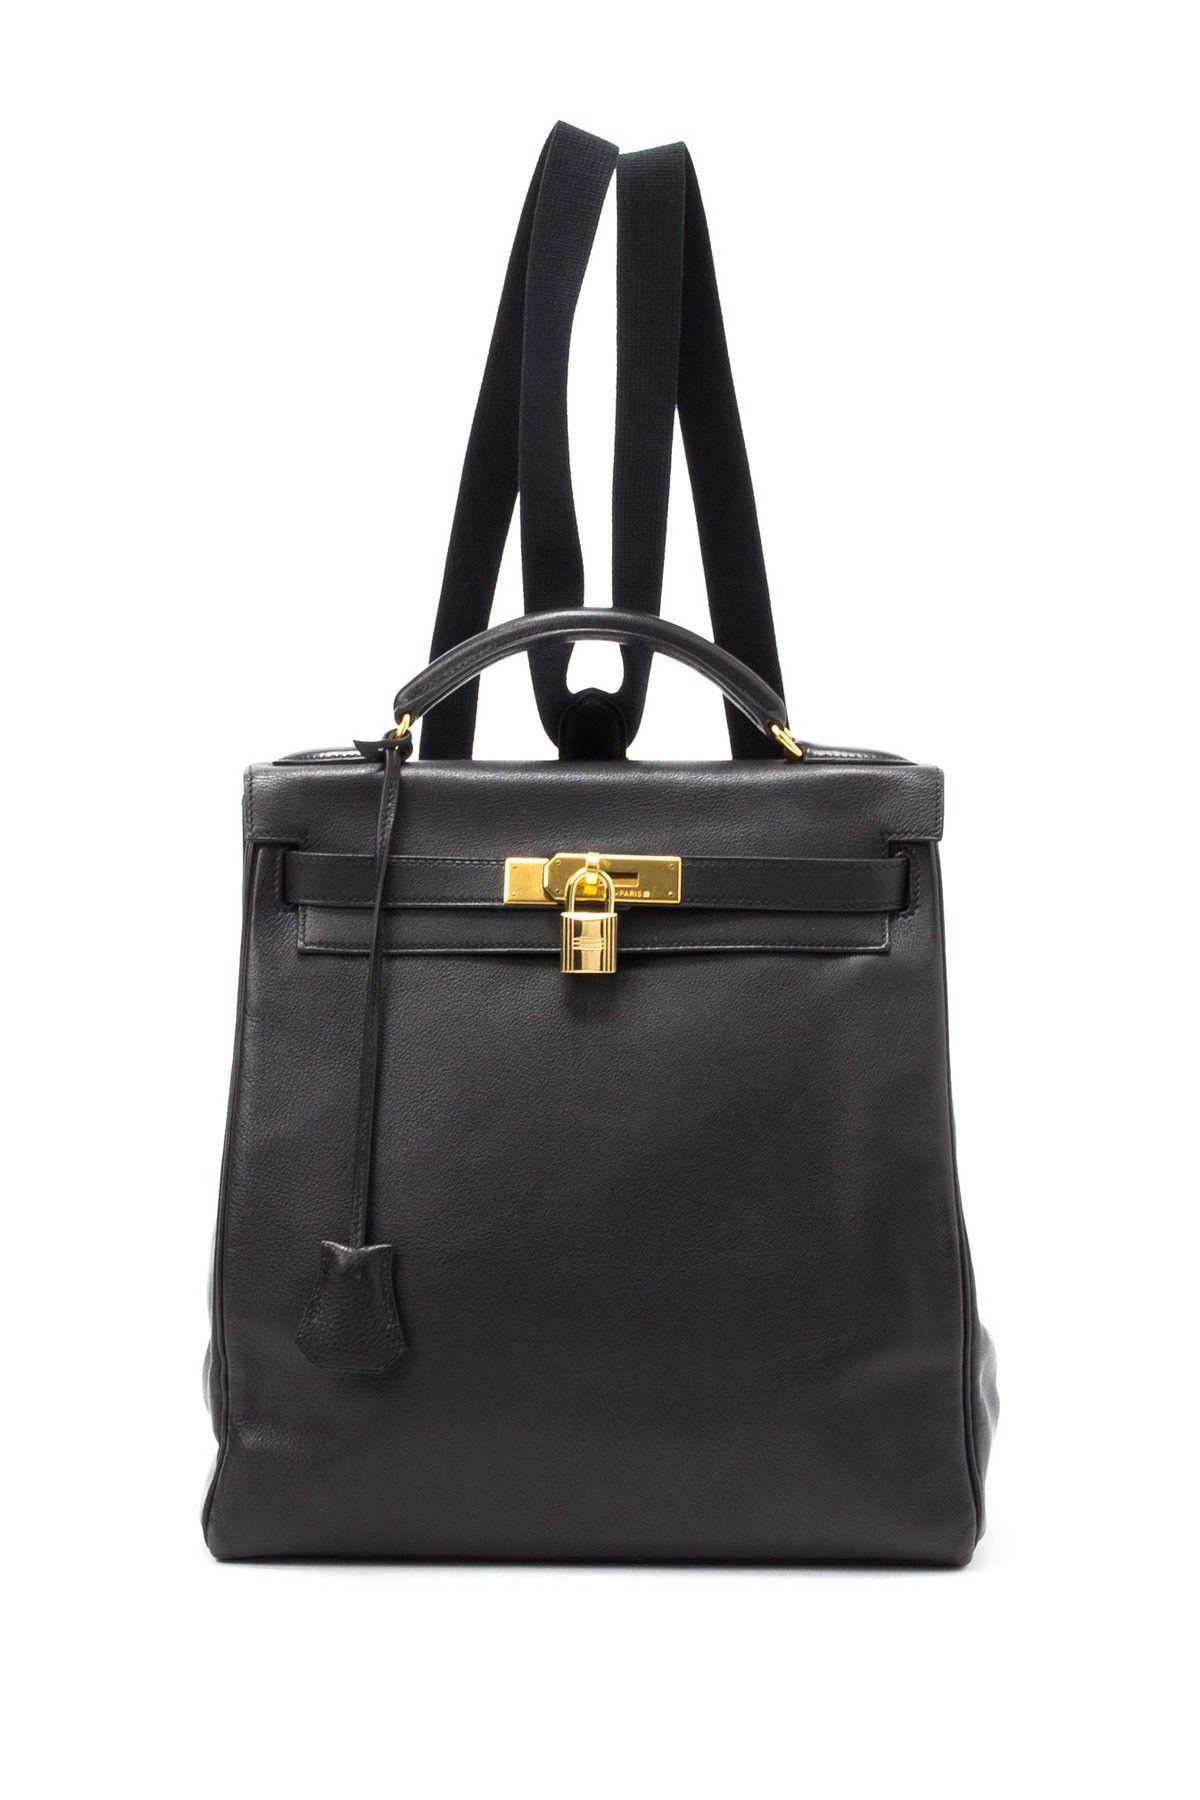 Hermes Black Backpack